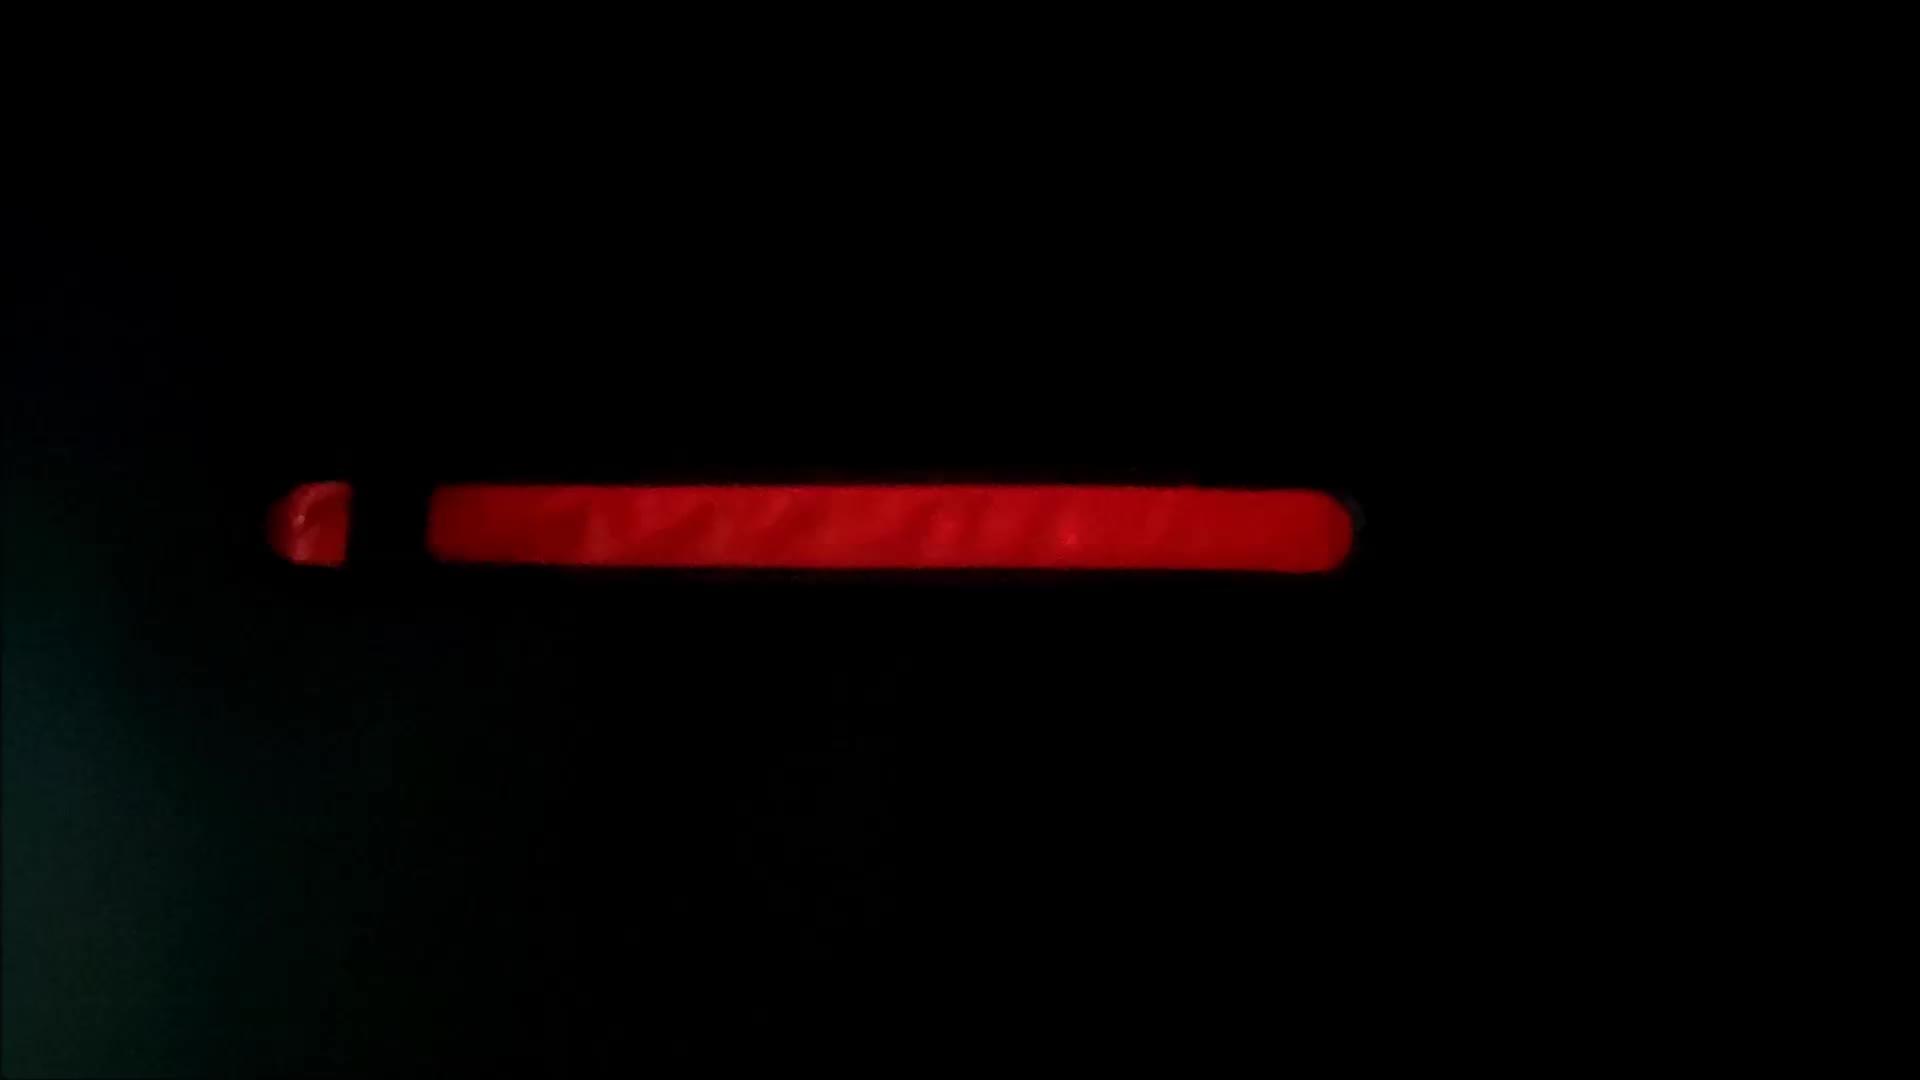 Aangepaste Slap Reflecterende Led Armband Glow In The Dark Running Led Slap Armband